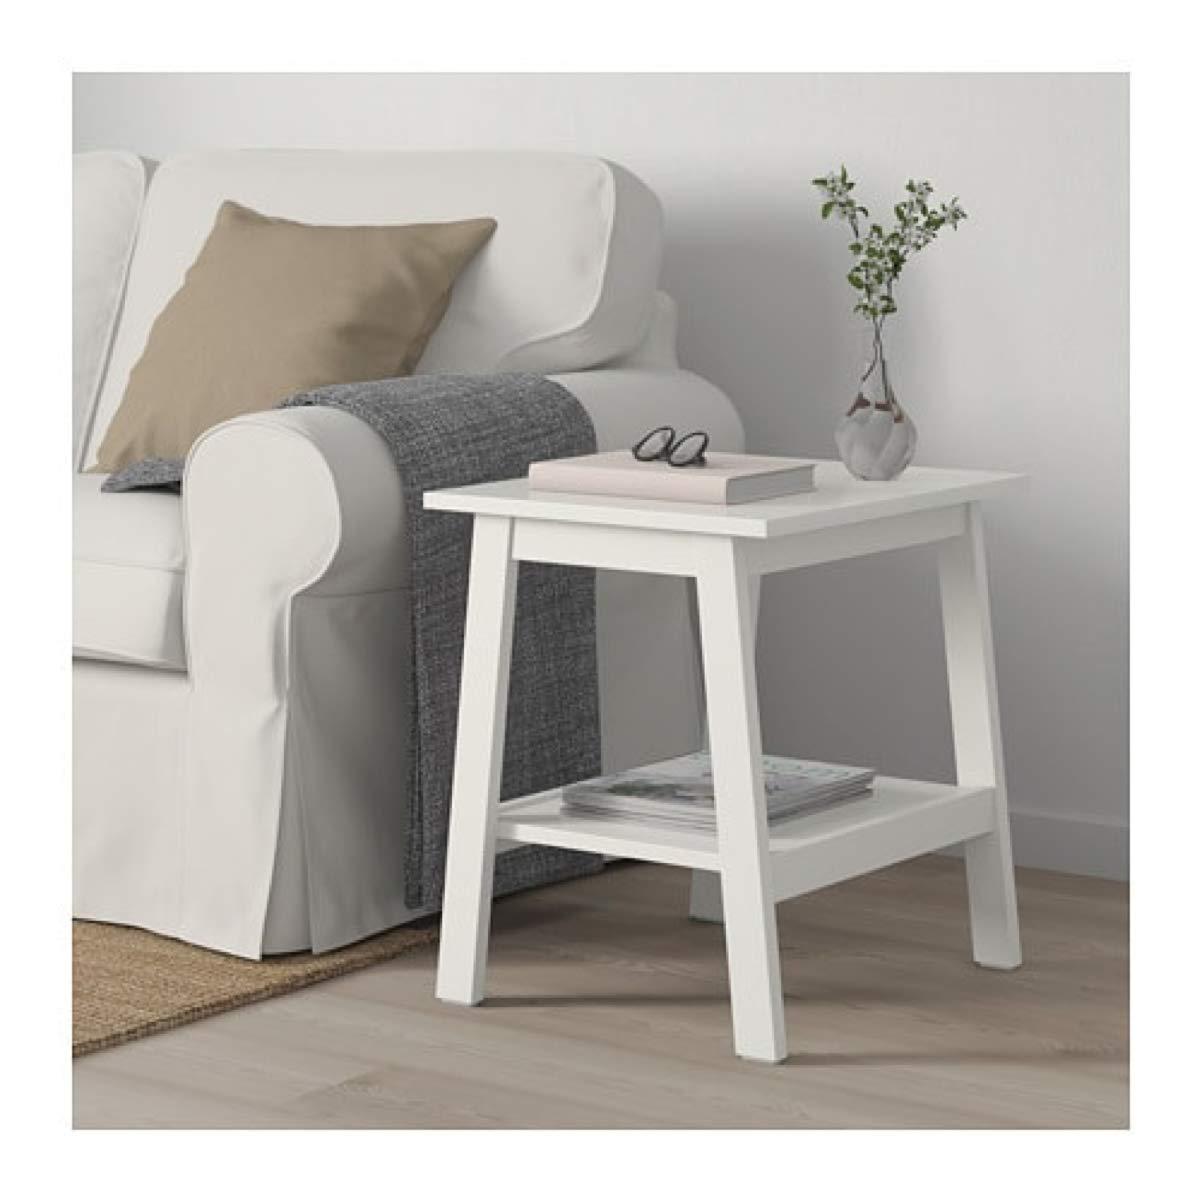 Ikea Lunnarp 703.990.20 - Mesa Auxiliar (tamaño 21, 5/8 x 17 3/4 ...